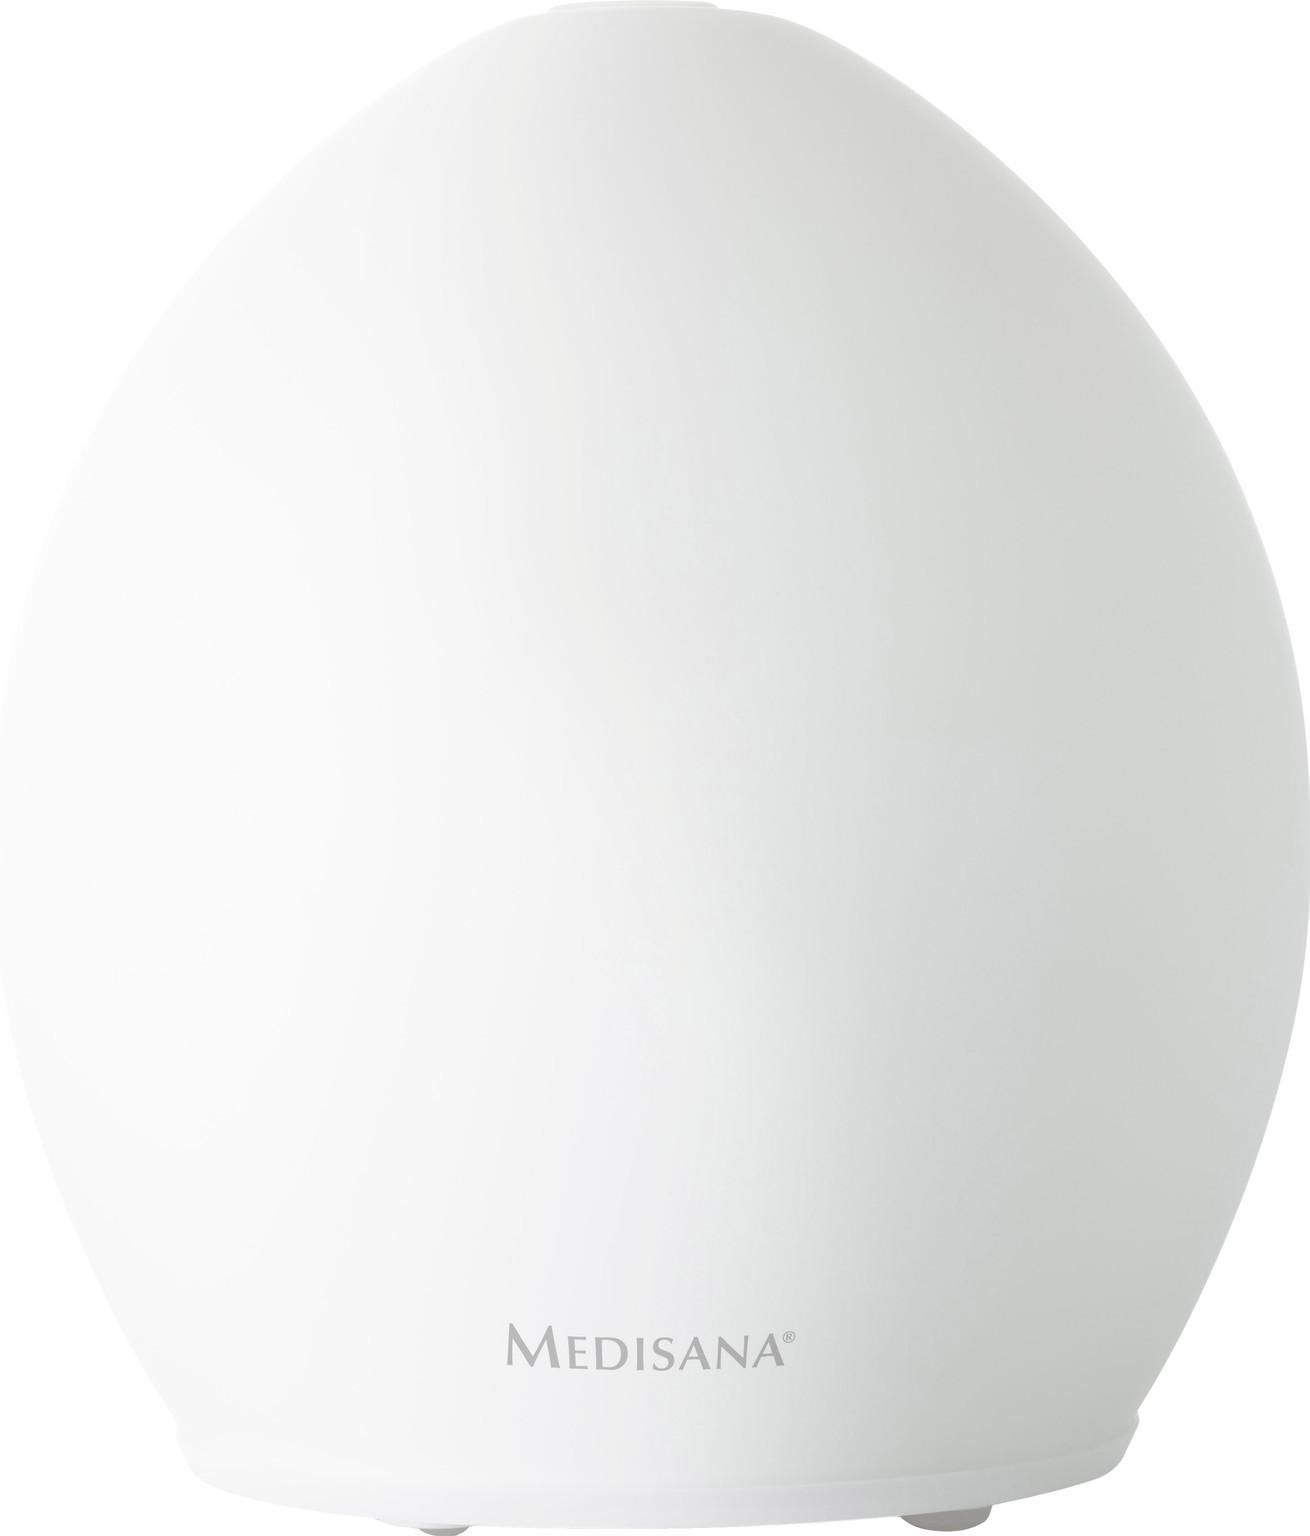 Medisana AD635 60085 T-MLX26855